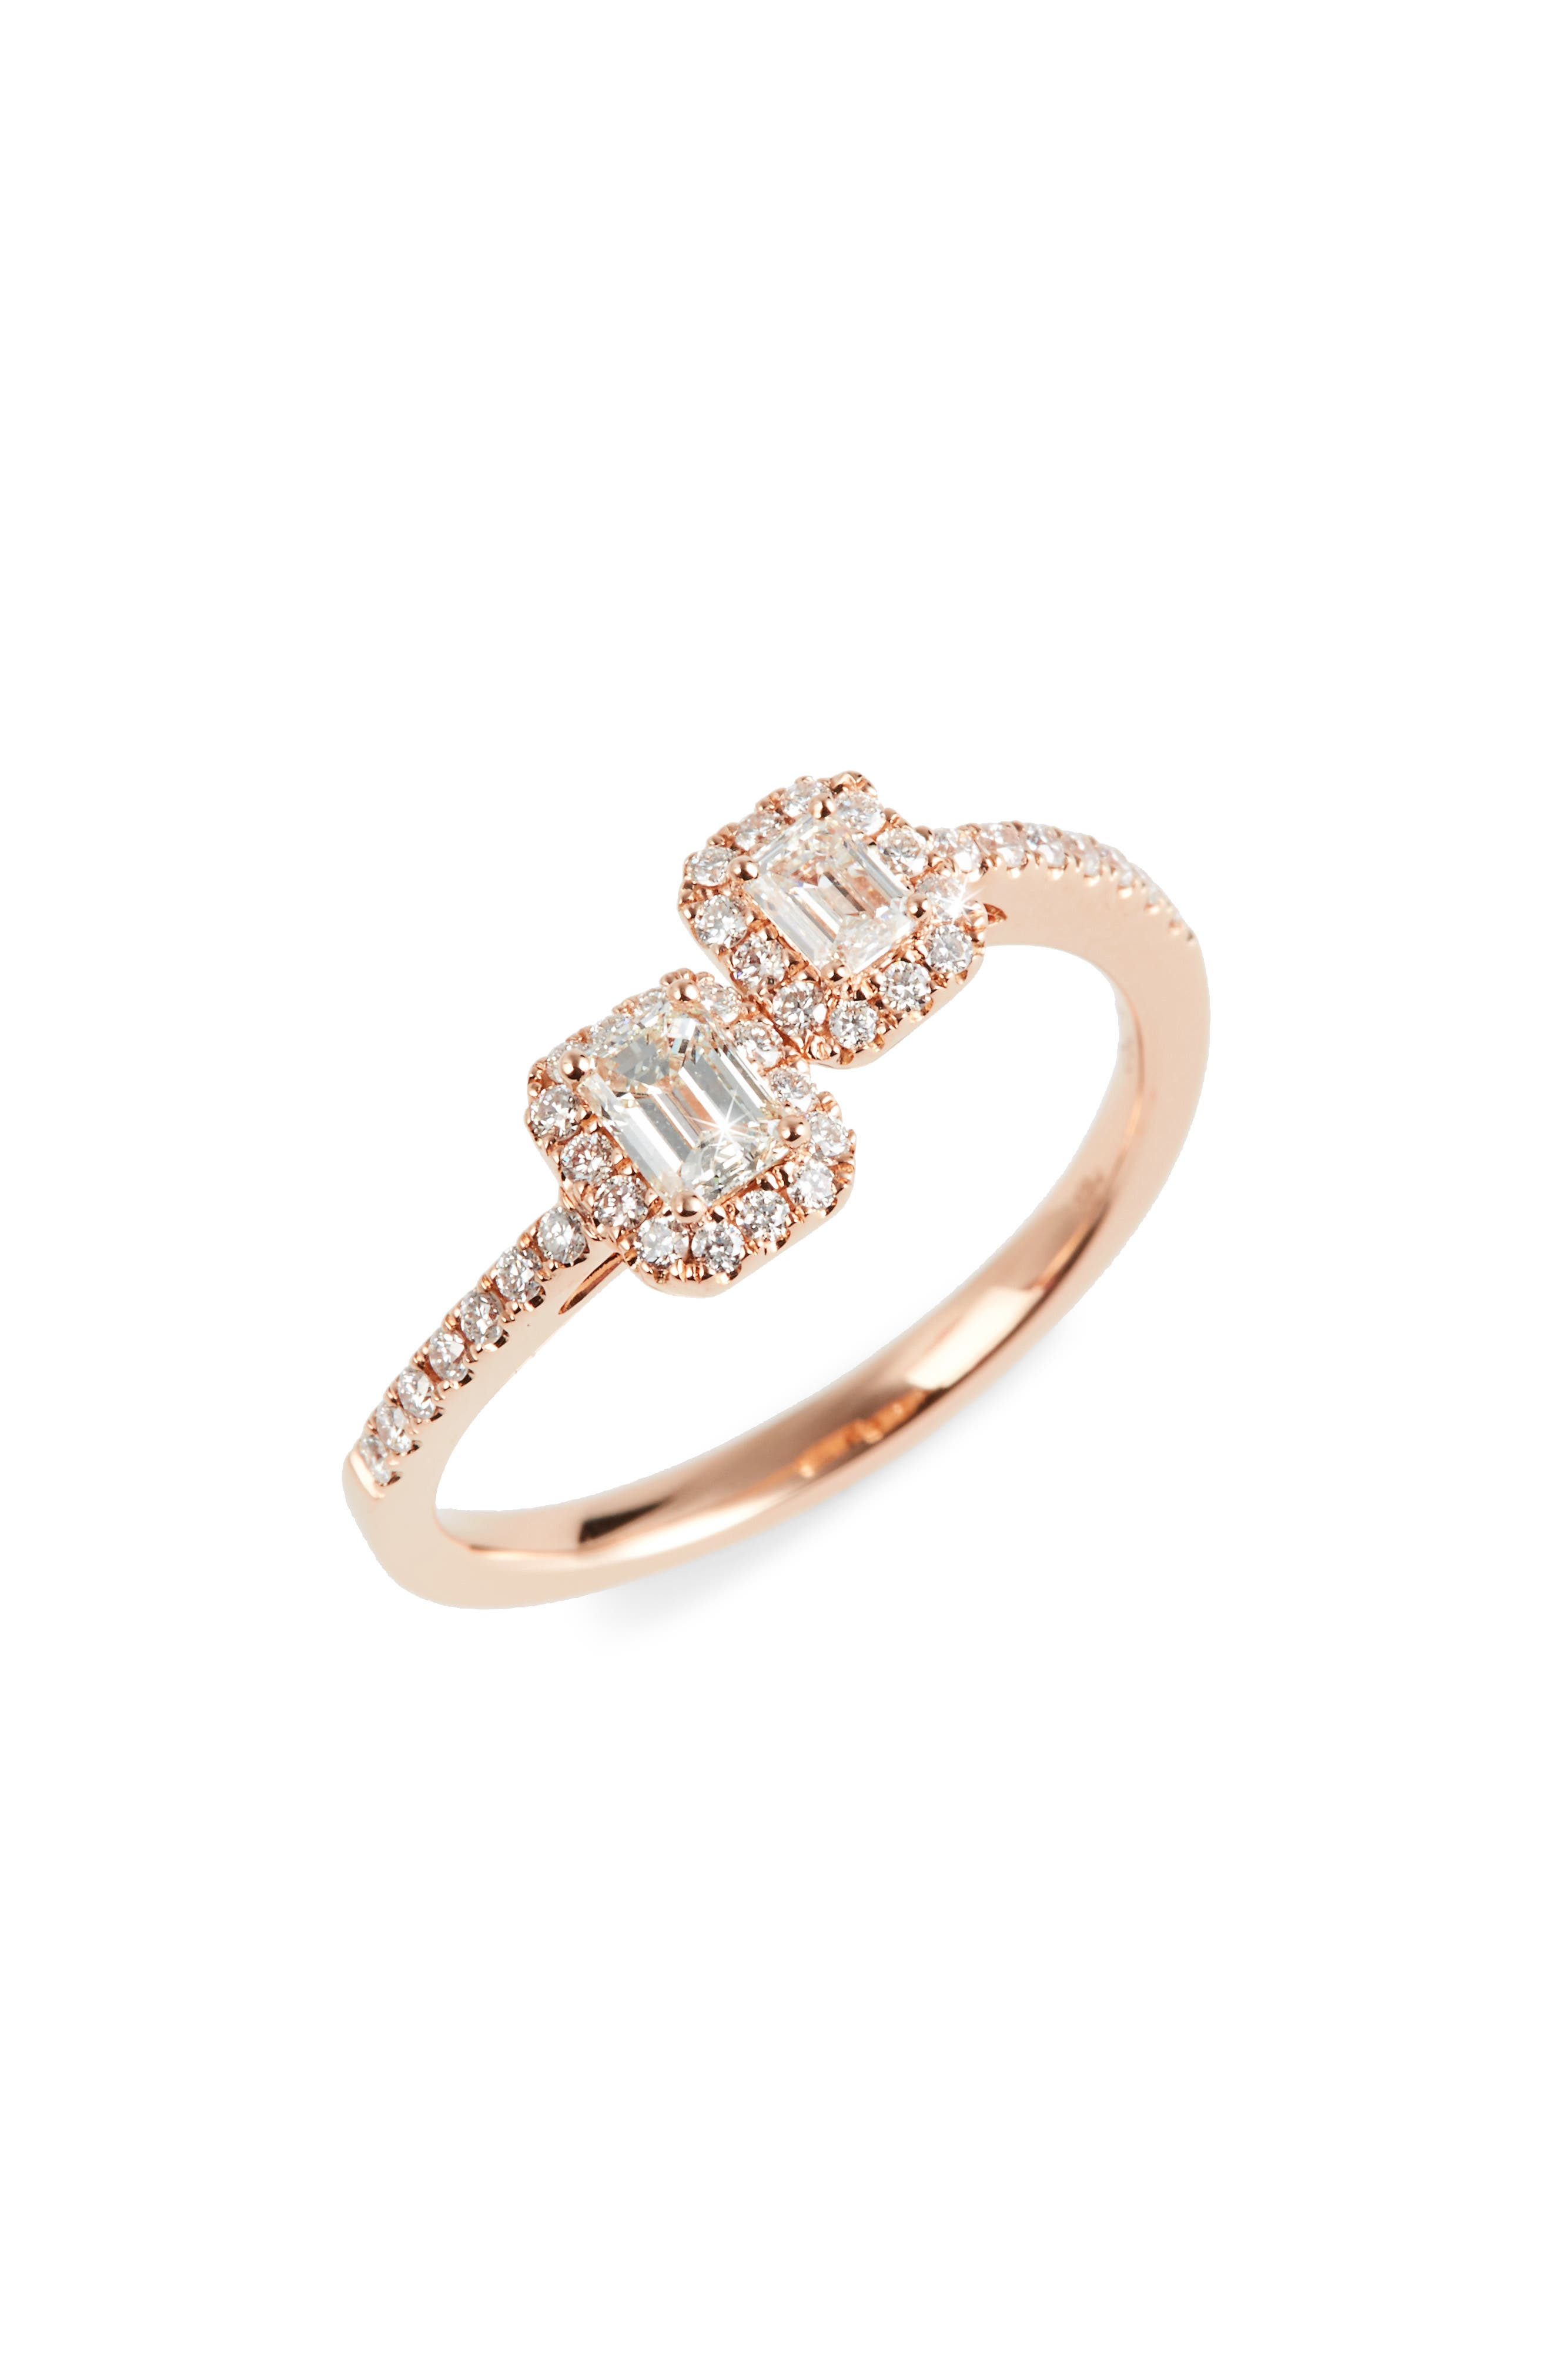 Stackable Diamond Ring,                             Main thumbnail 1, color,                             Rose Gold